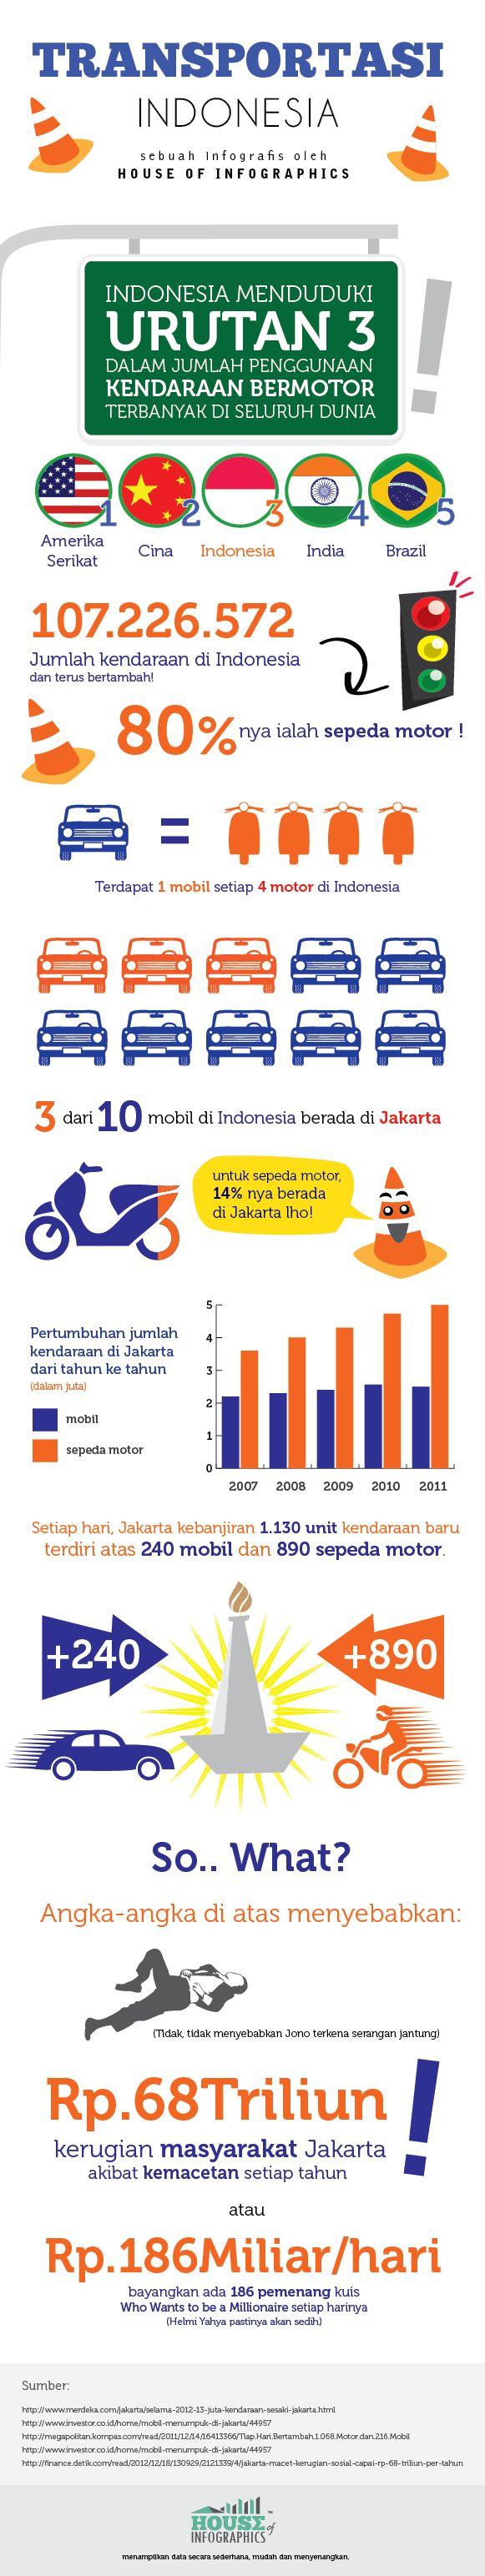 "Infographic, ""Transportasi di Indonesia"". Bahasa. Kendaraan."